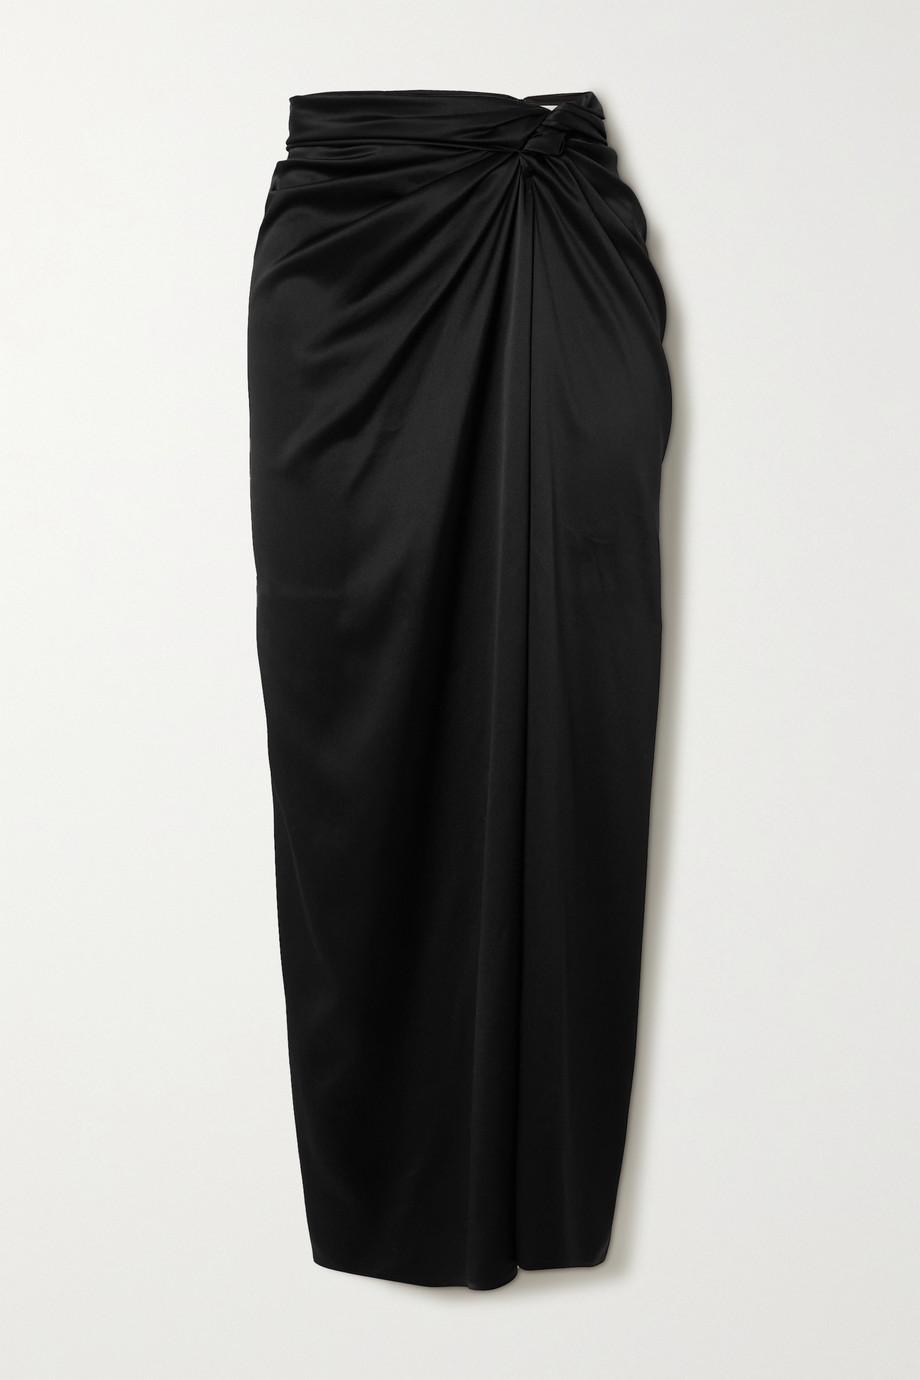 Magda Butrym Gathered stretch-silk satin midi skirt